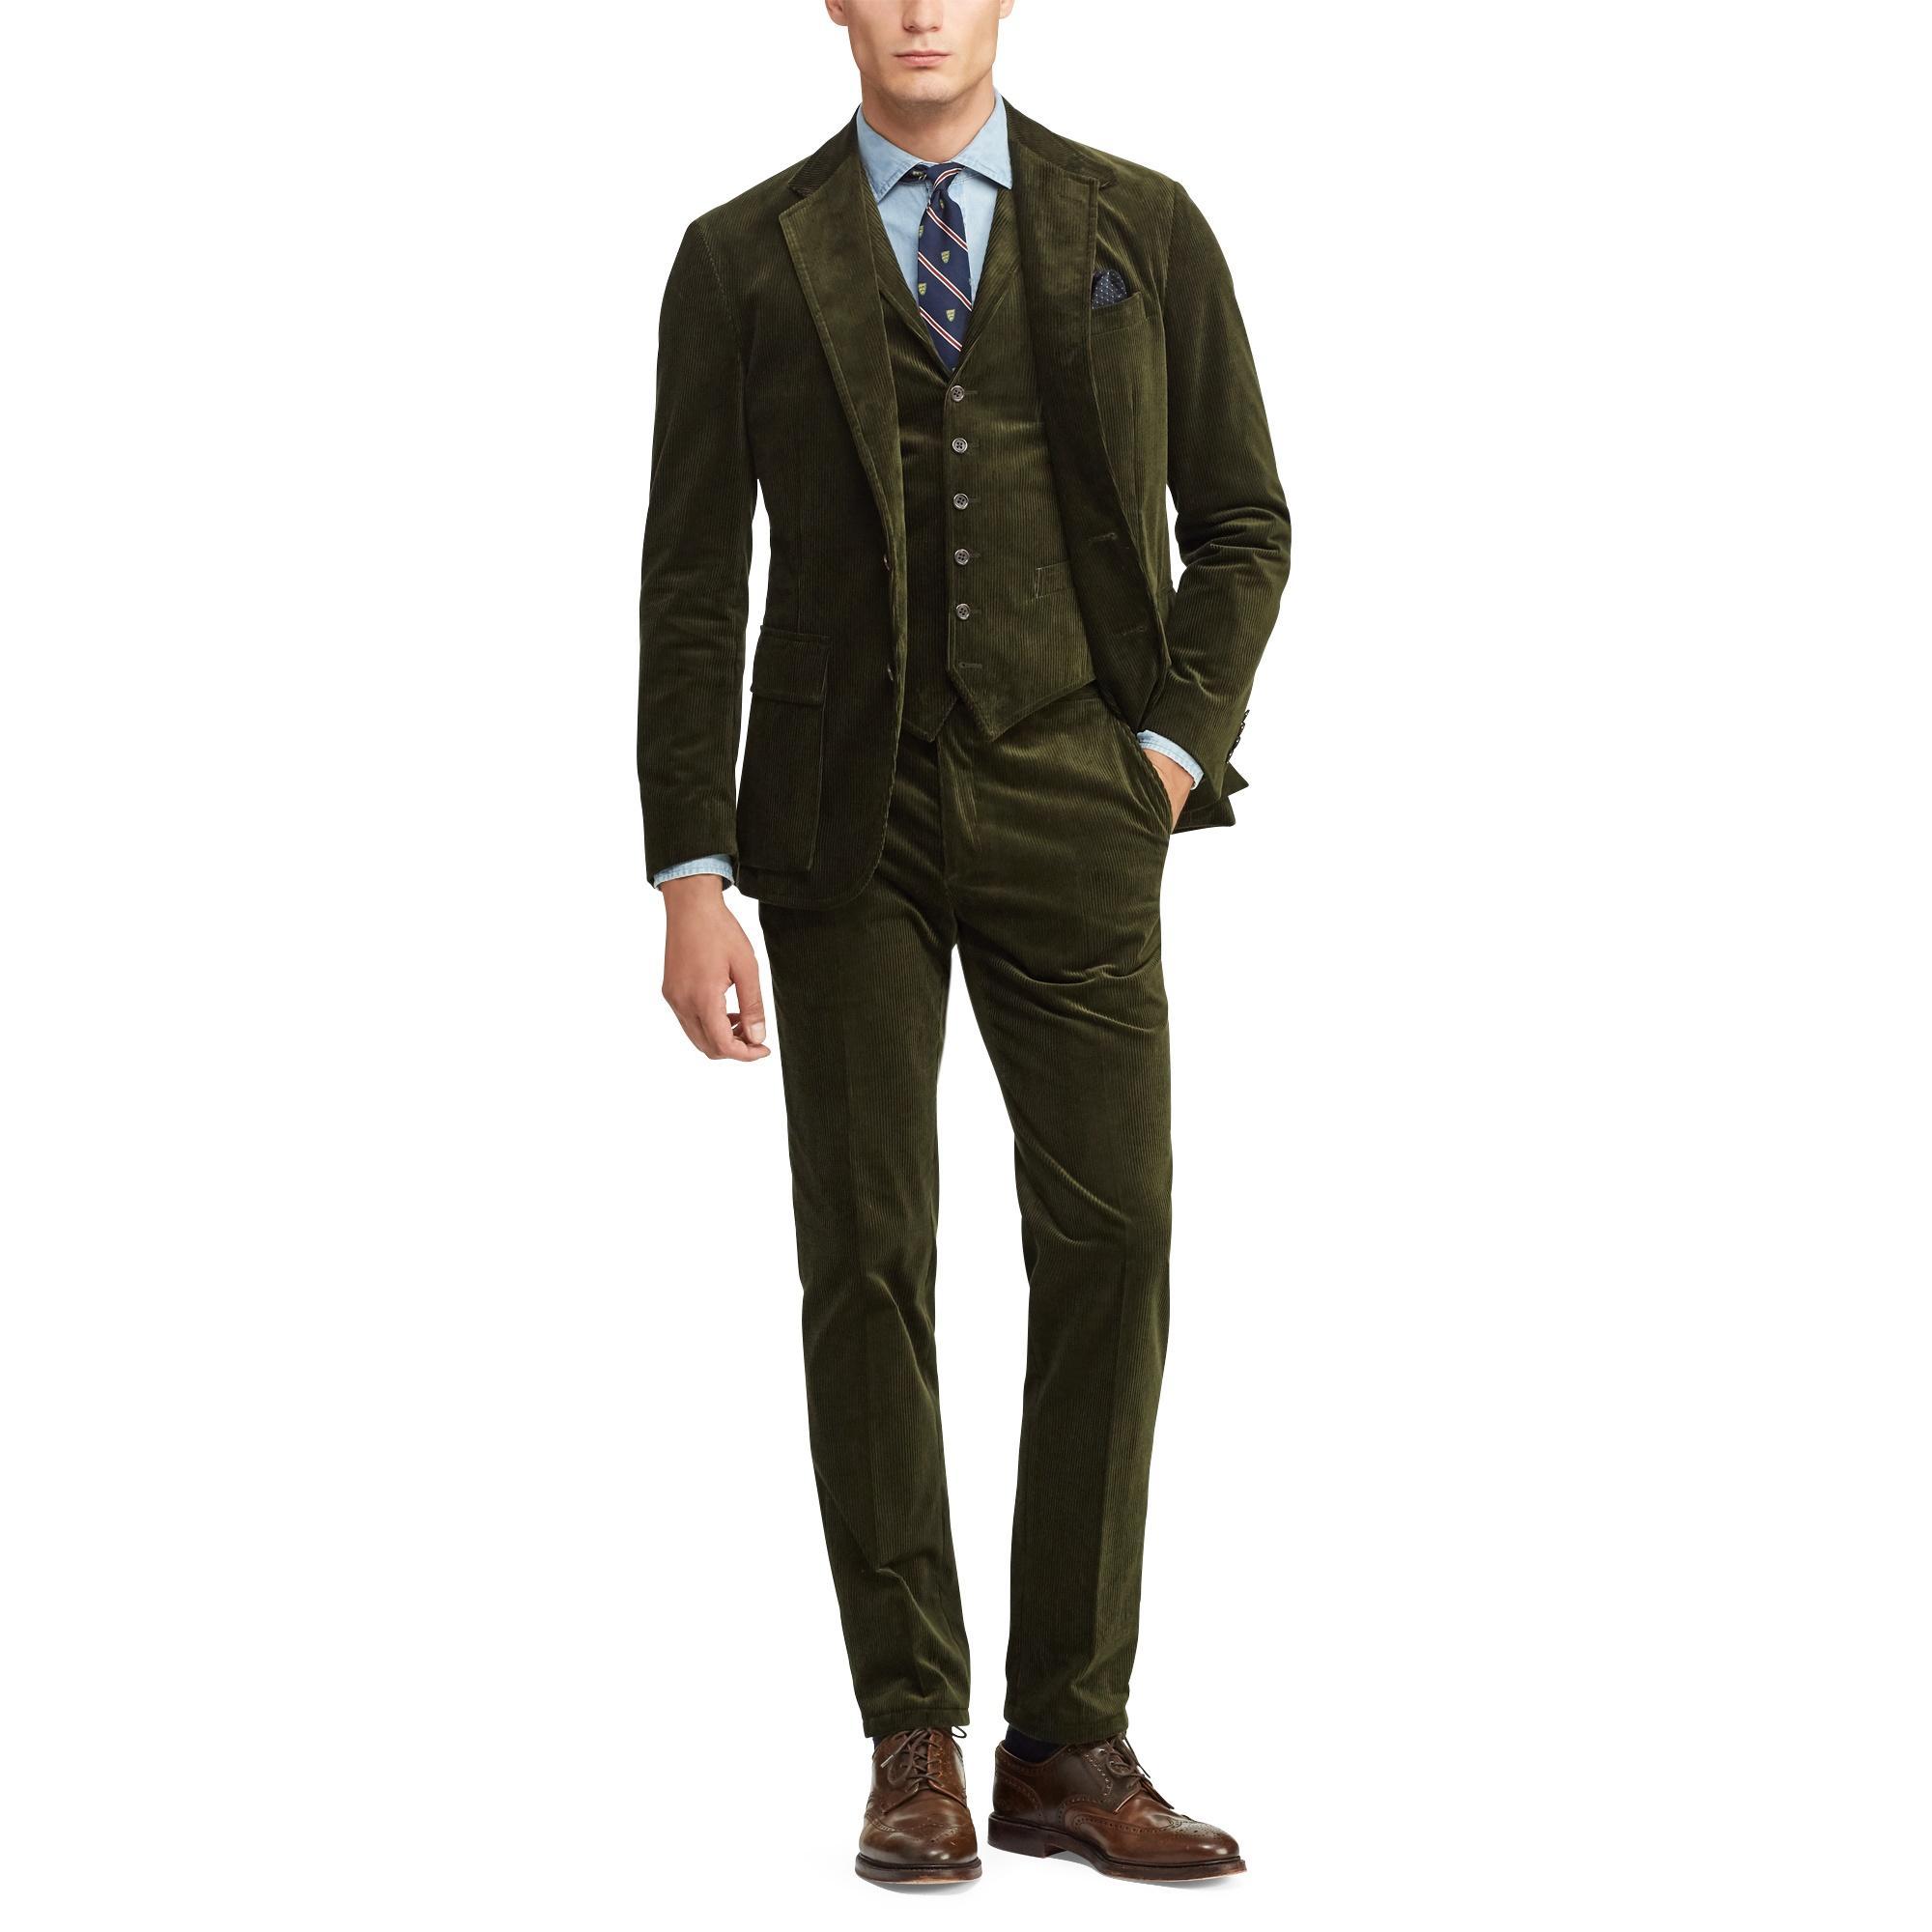 306b56ea40 Lyst - Polo Ralph Lauren Polo Corduroy Suit Trouser in Brown for Men